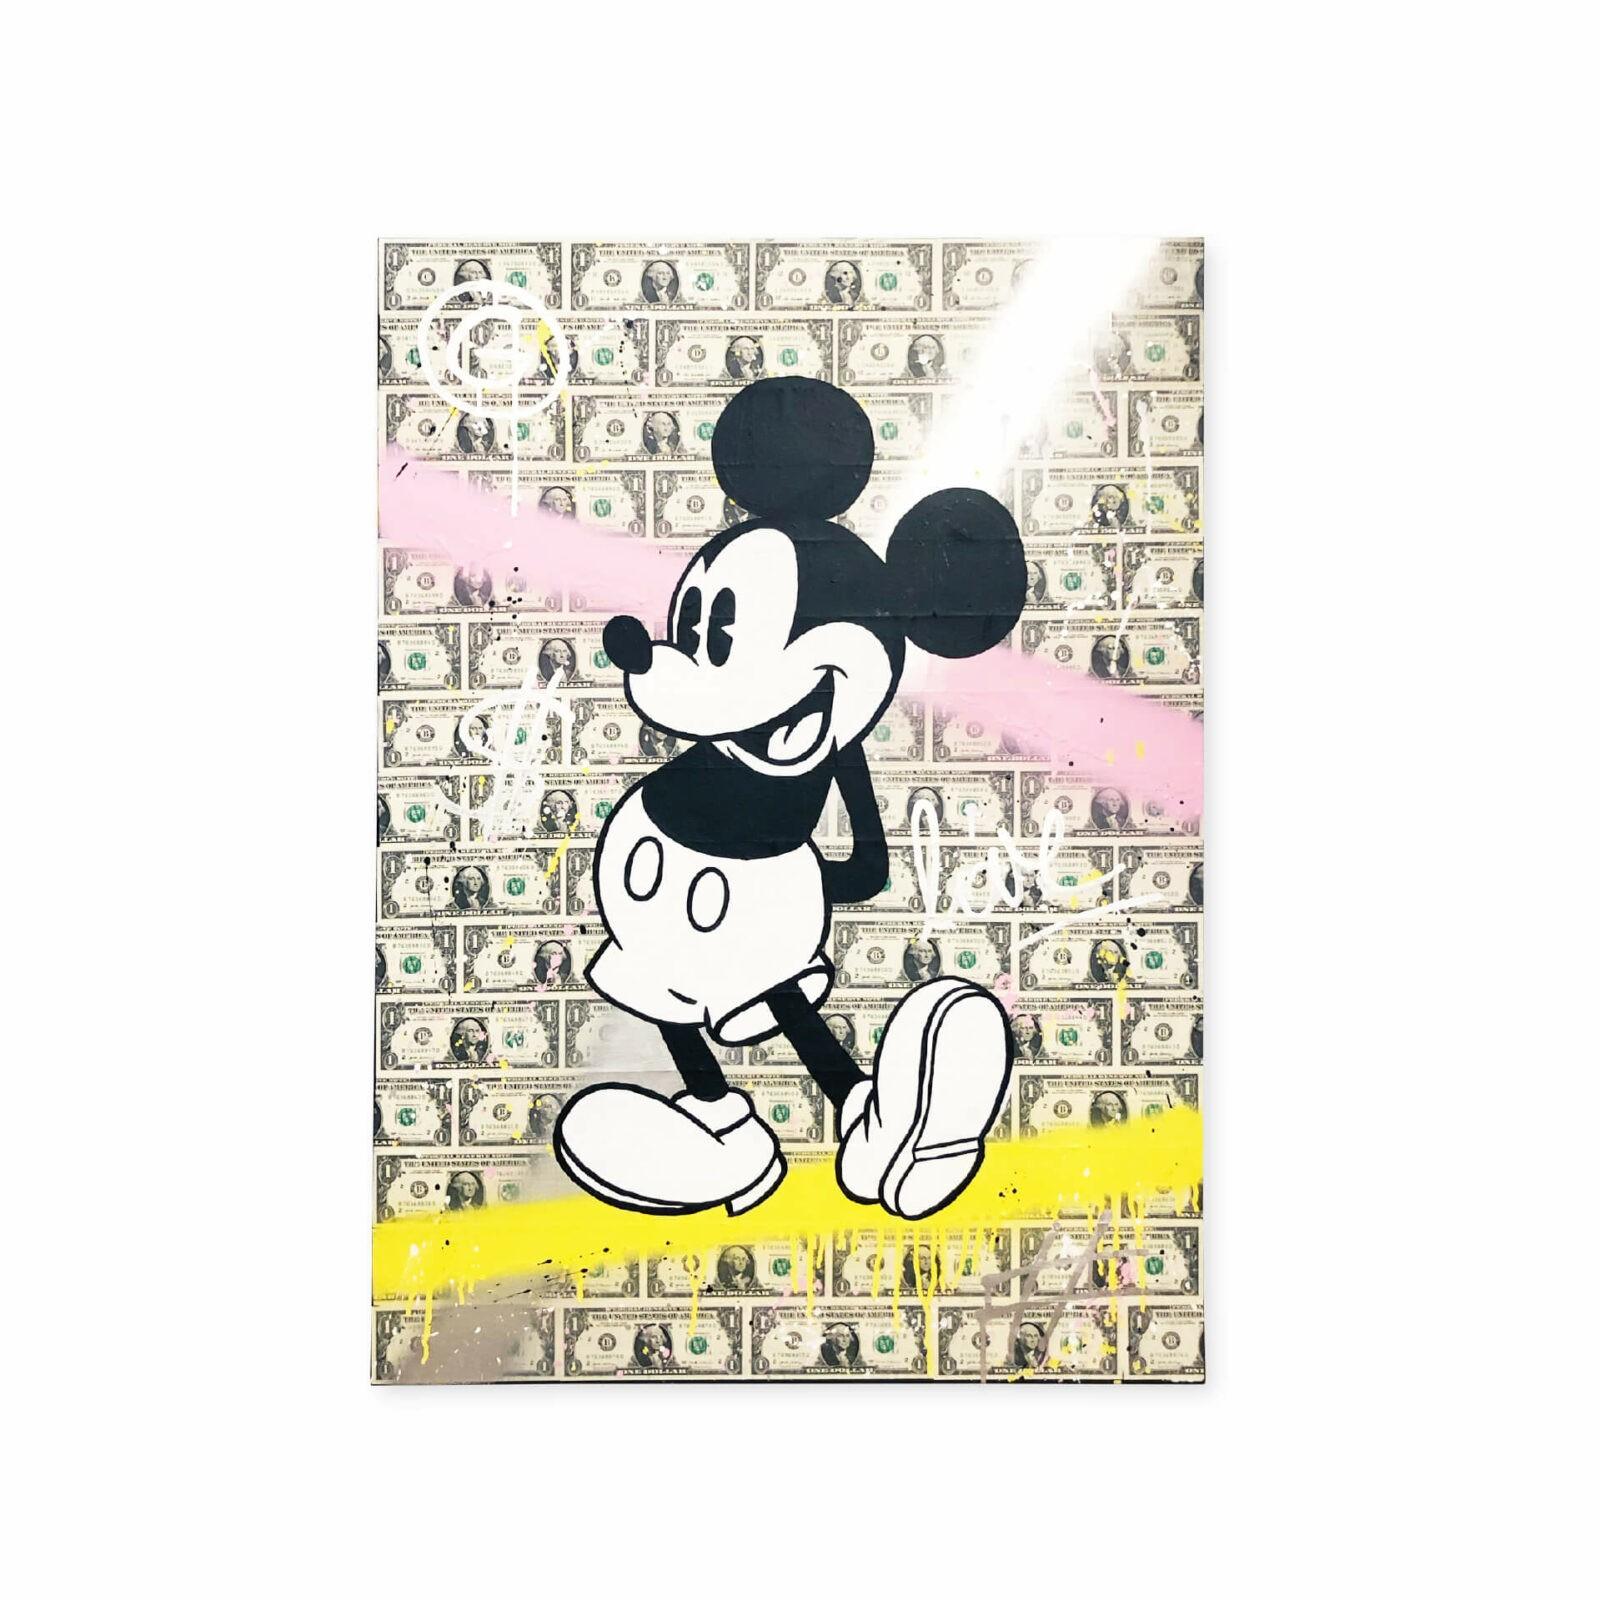 Marcin-Glod-Art-Mickey-2019